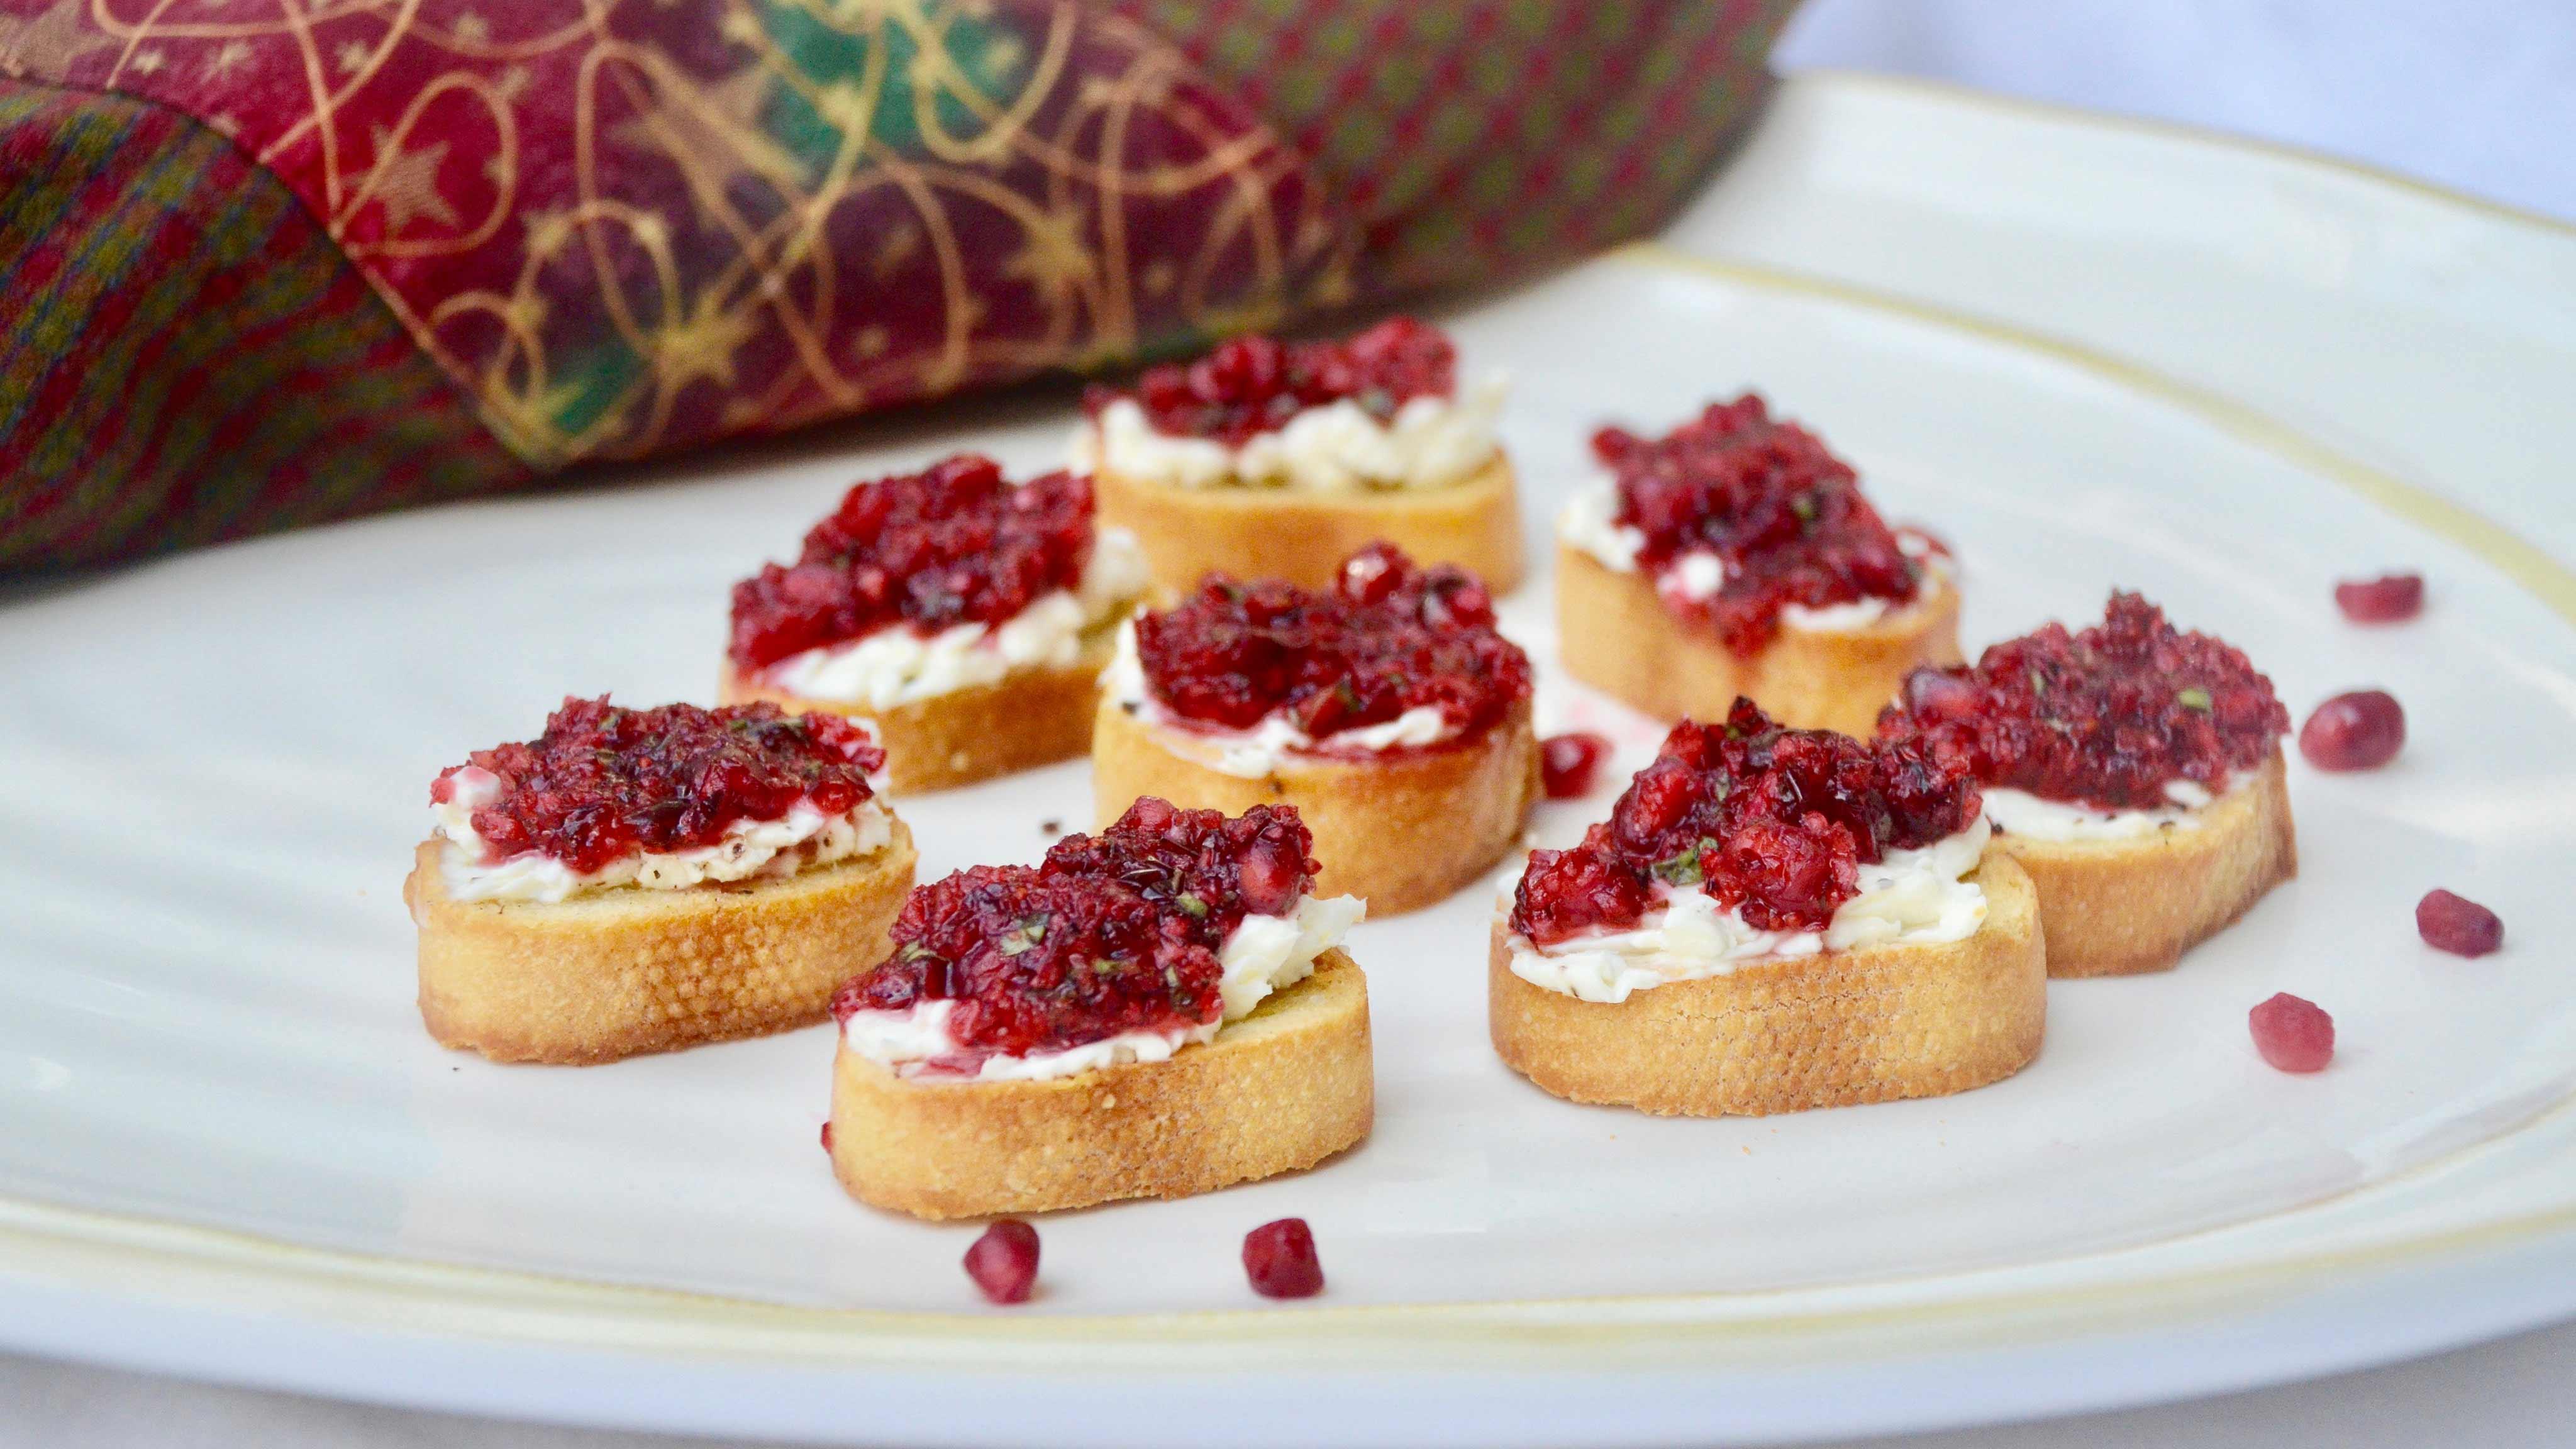 Image for Recipe Fresh Cranberry and Pomegranate Bruschetta